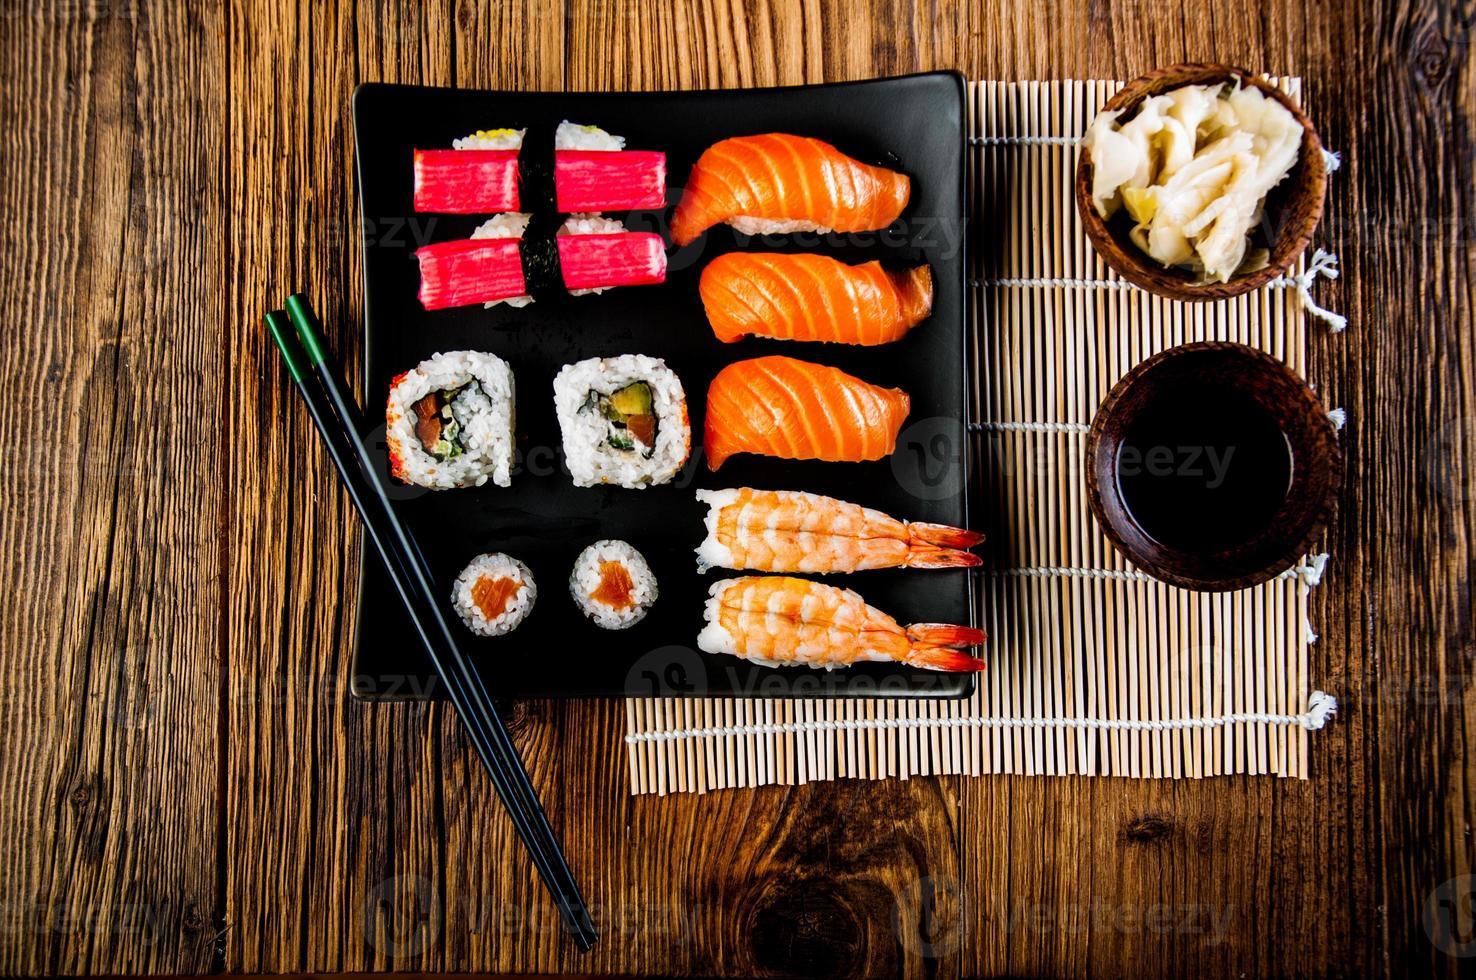 conjunto de sushi fresco japonés foto